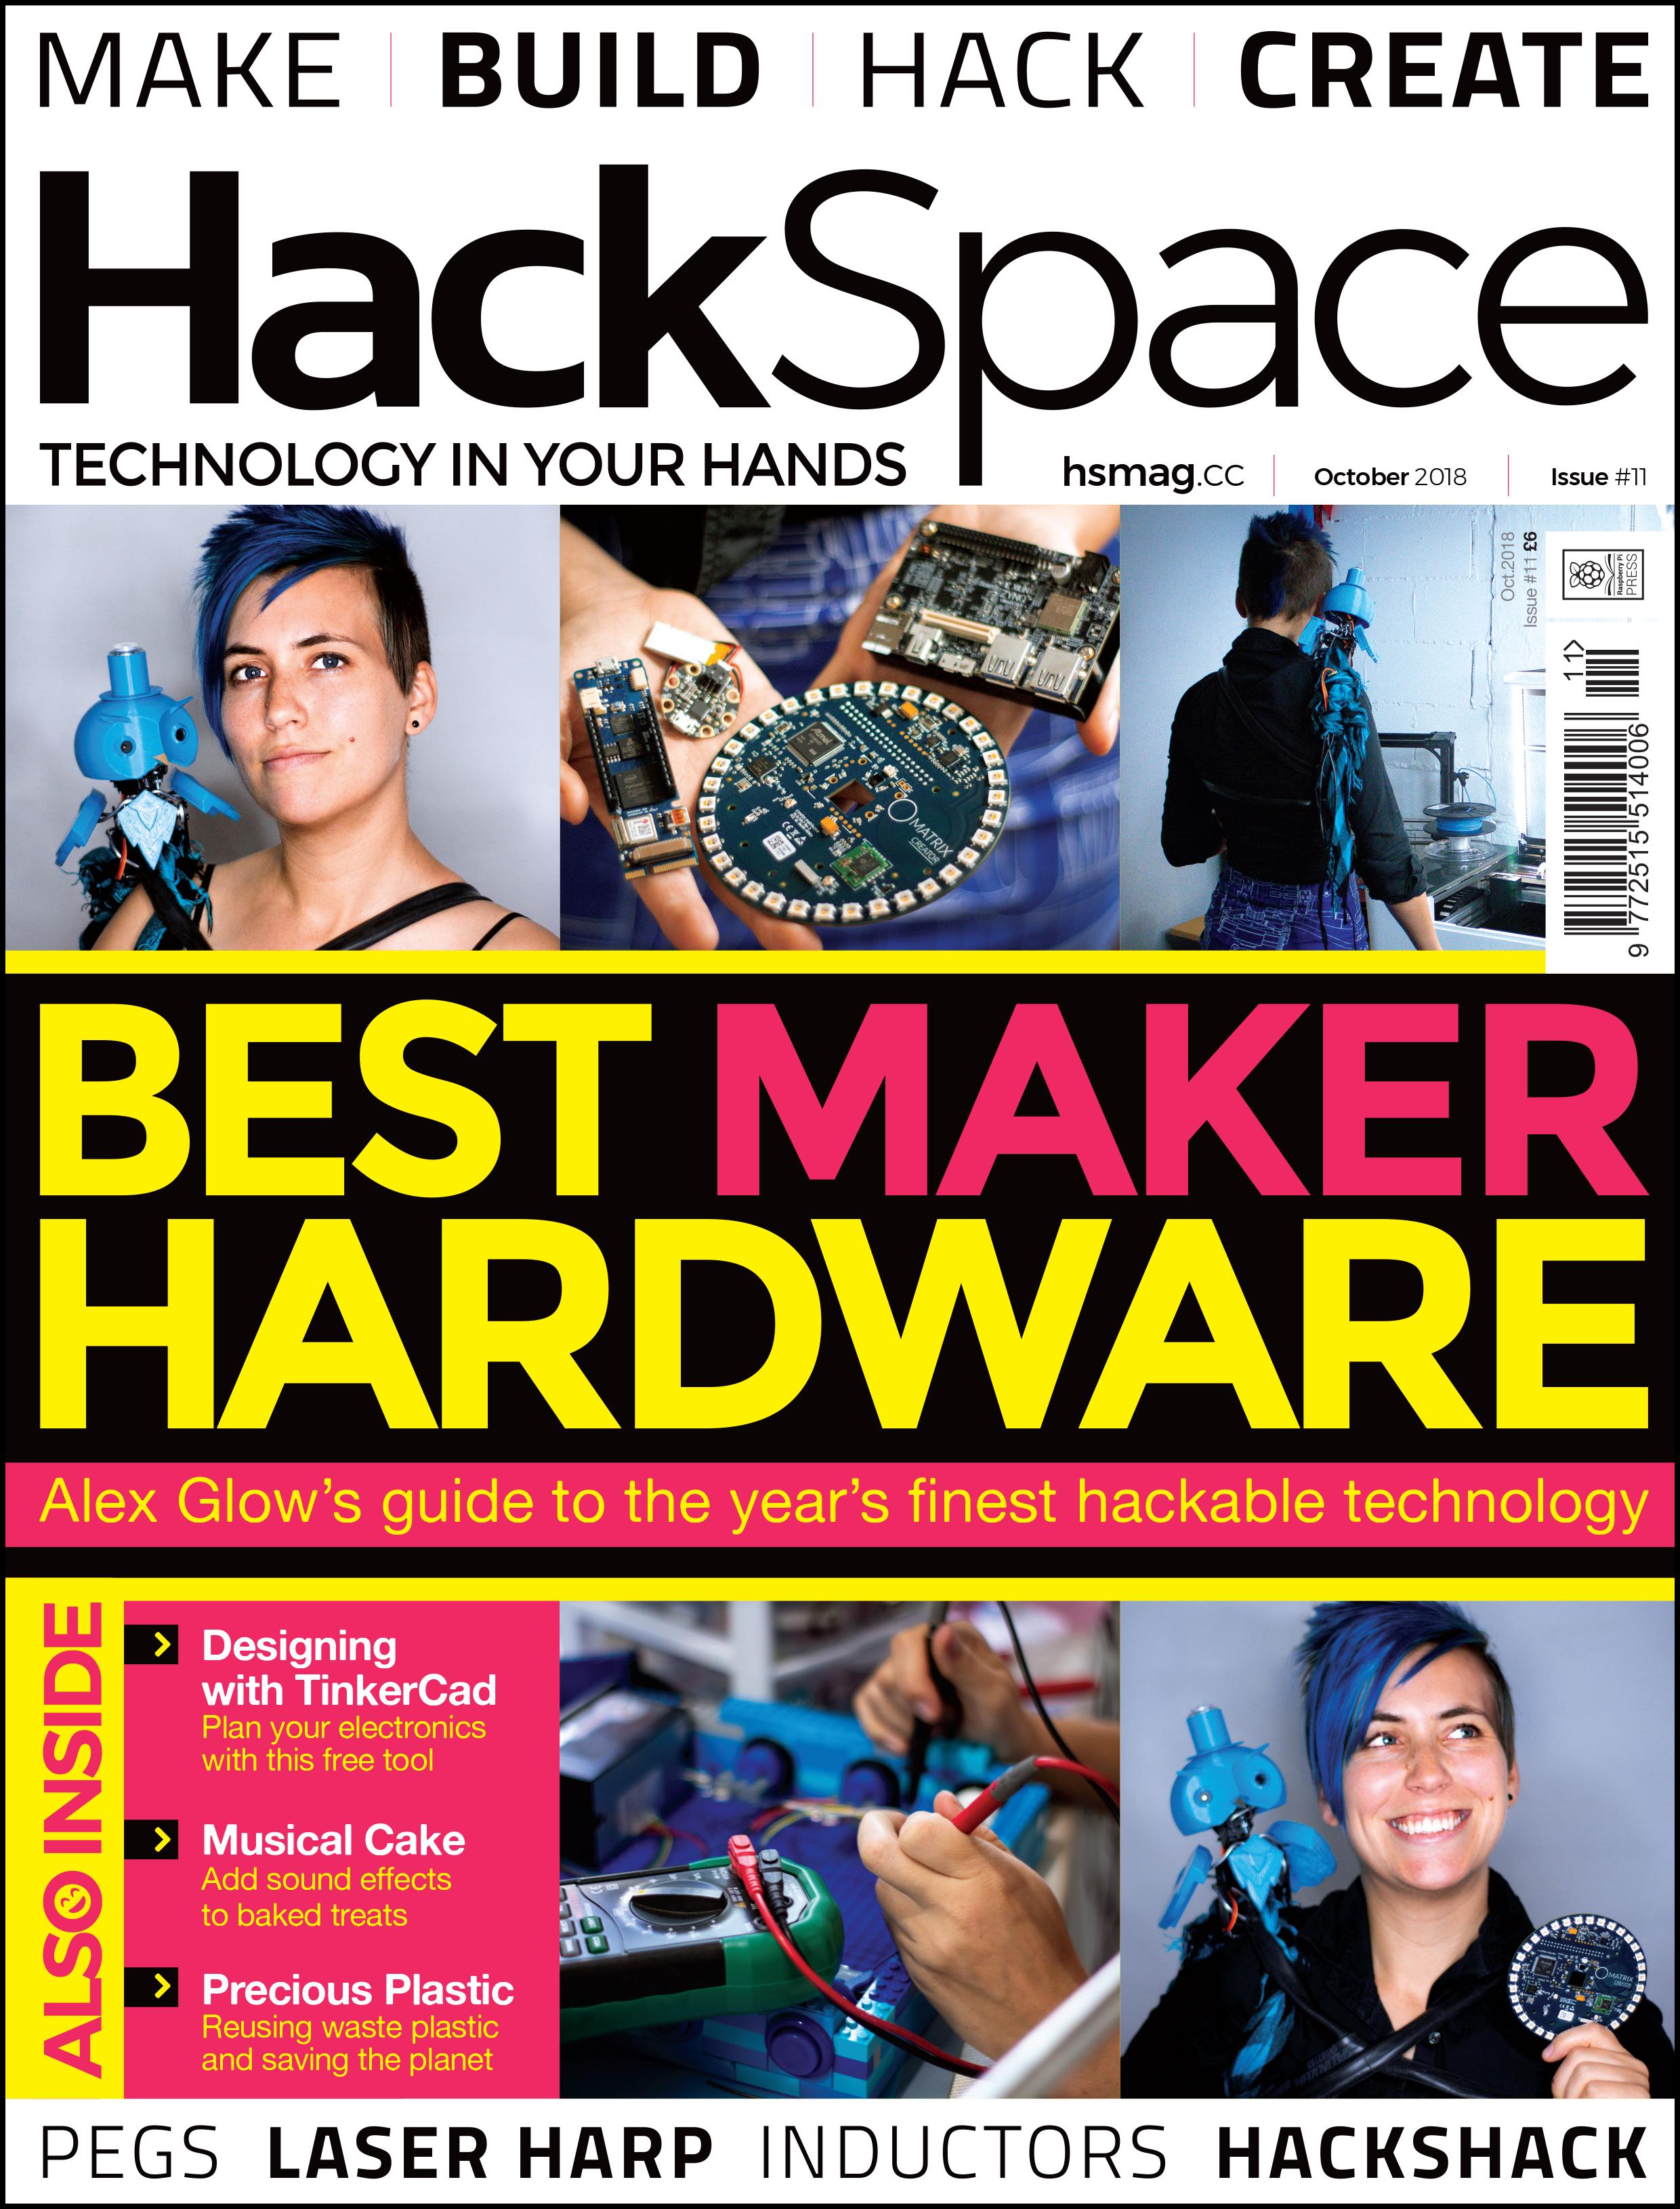 HackSpace magazine 11: best maker hardware